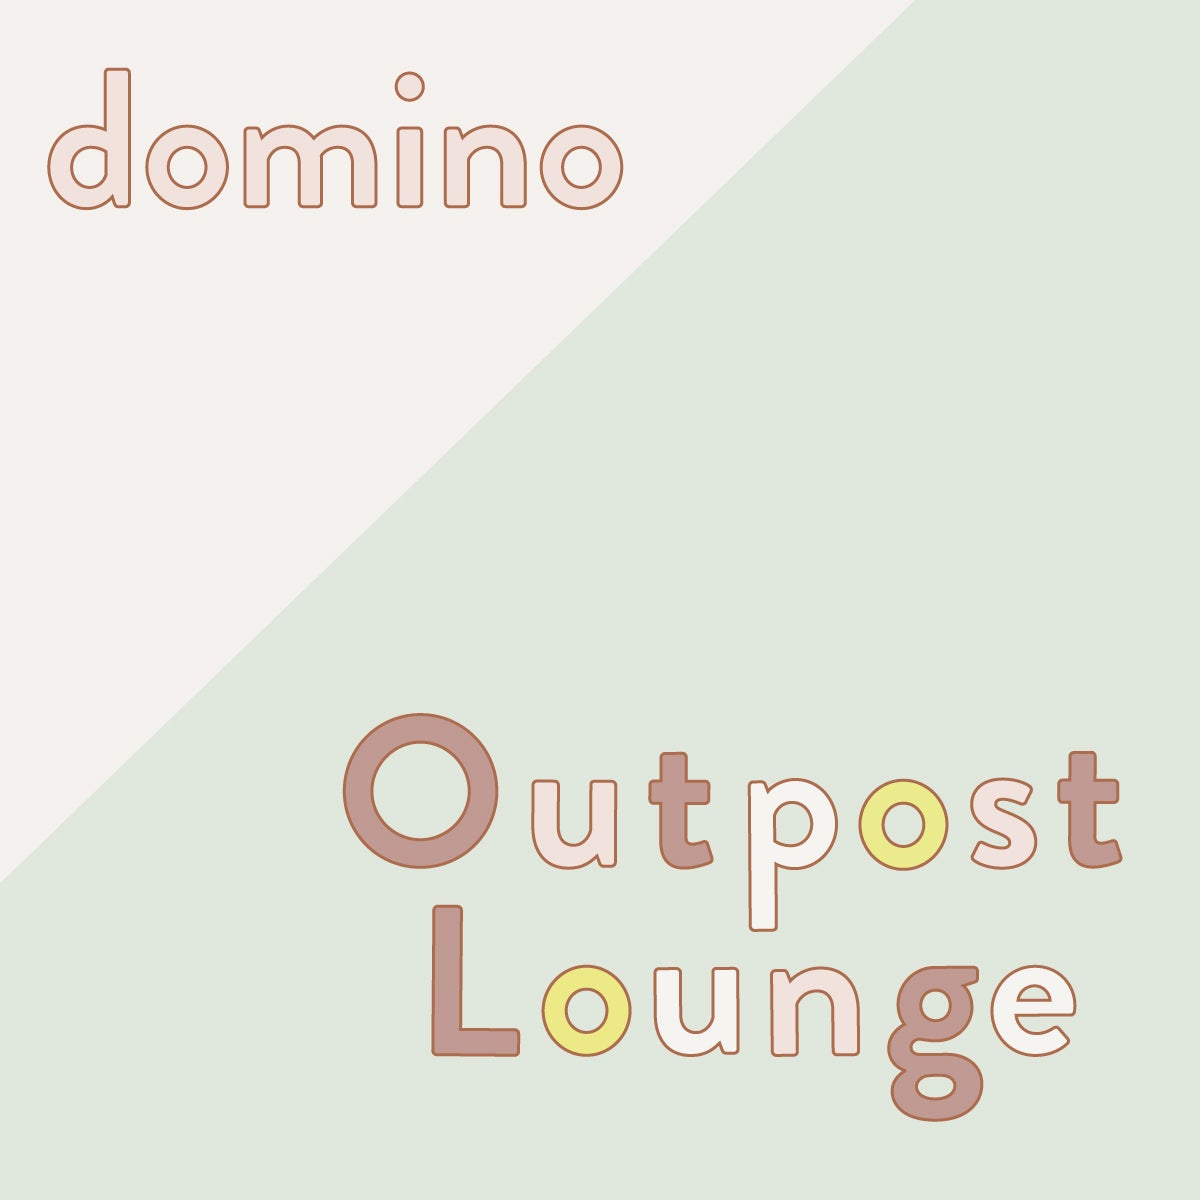 domino outpost lounge hamptons logo